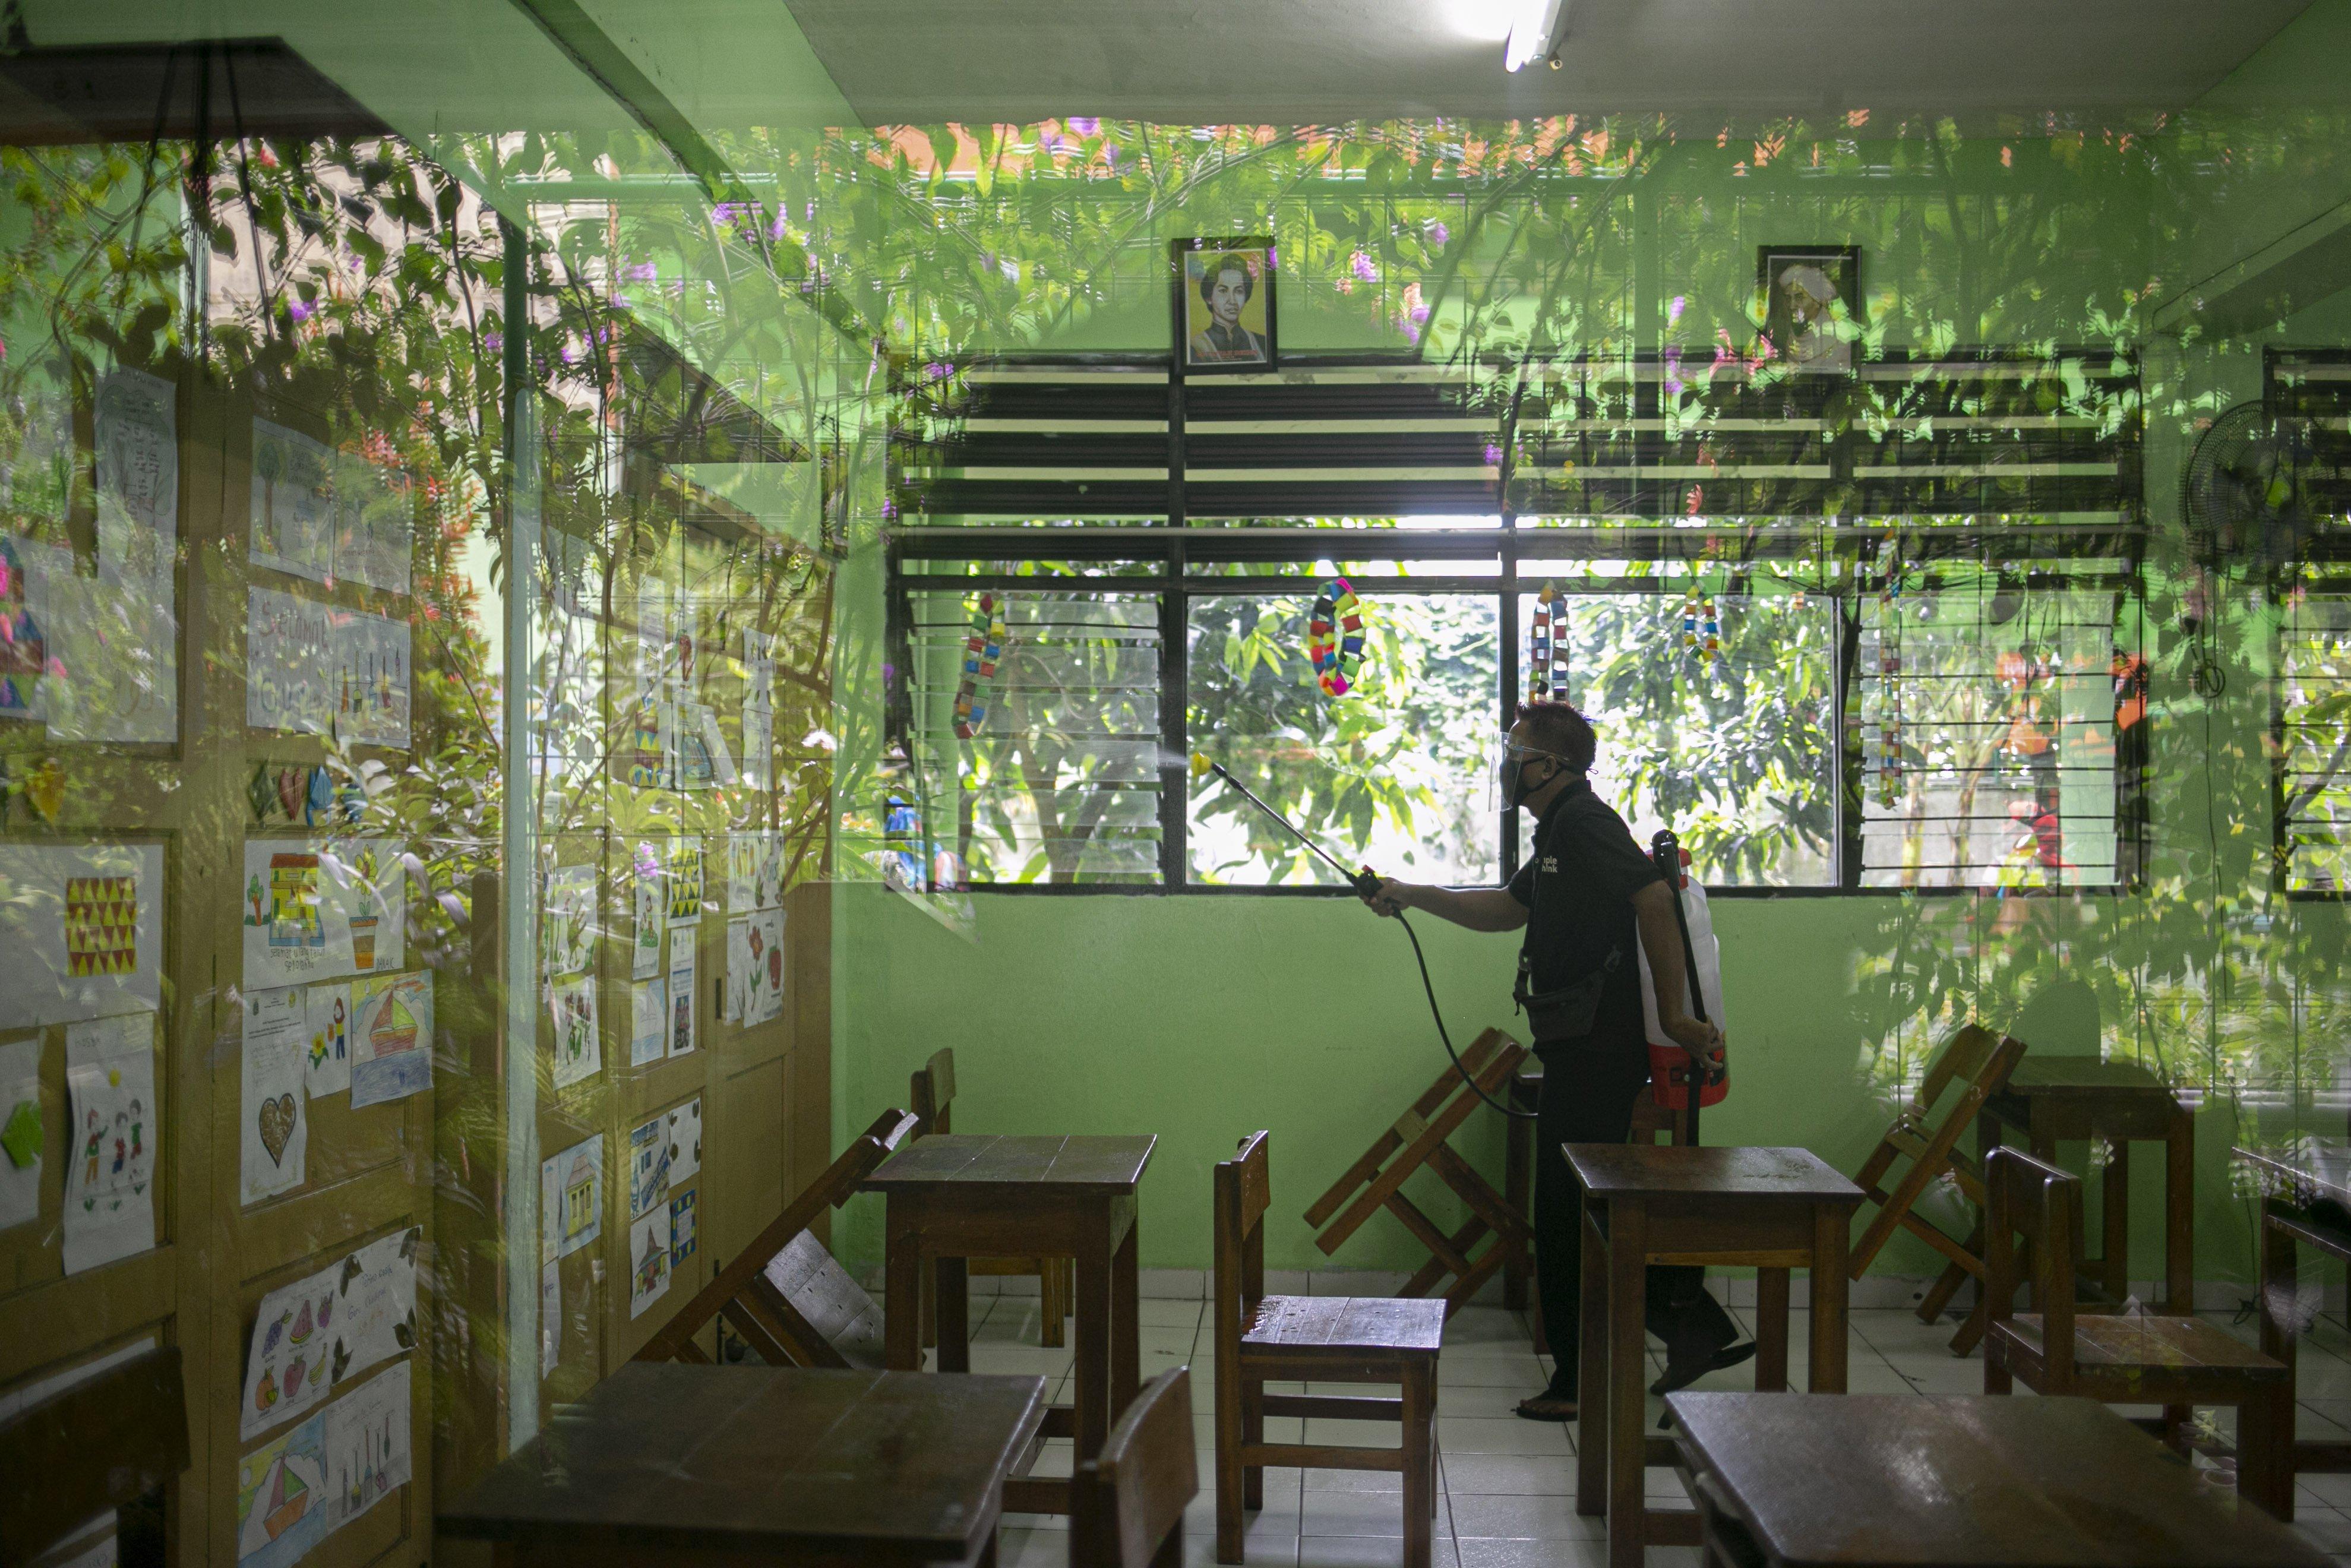 Petugas menyemprotkan cairan disinfektan seblum melaksanakan pembelajaran tatap muka di SDN Kenari 08 pagi, Jakarta, Rabu (7/4/2021). Pemerintah Provinsi DKI akan melakukan uji coba pembelajaran tatap muka terbatas di 85 sekolah mulai 7 April hingga 29 April 2021 dengan menerapkan protokol kesehatan Covid-19 yang ketat. Skema yang akan diterapkan adalah pembelajaran tatap muka secara bergantian di dalam ruangan maksimum 50 persen dari kapasitas ruangan.